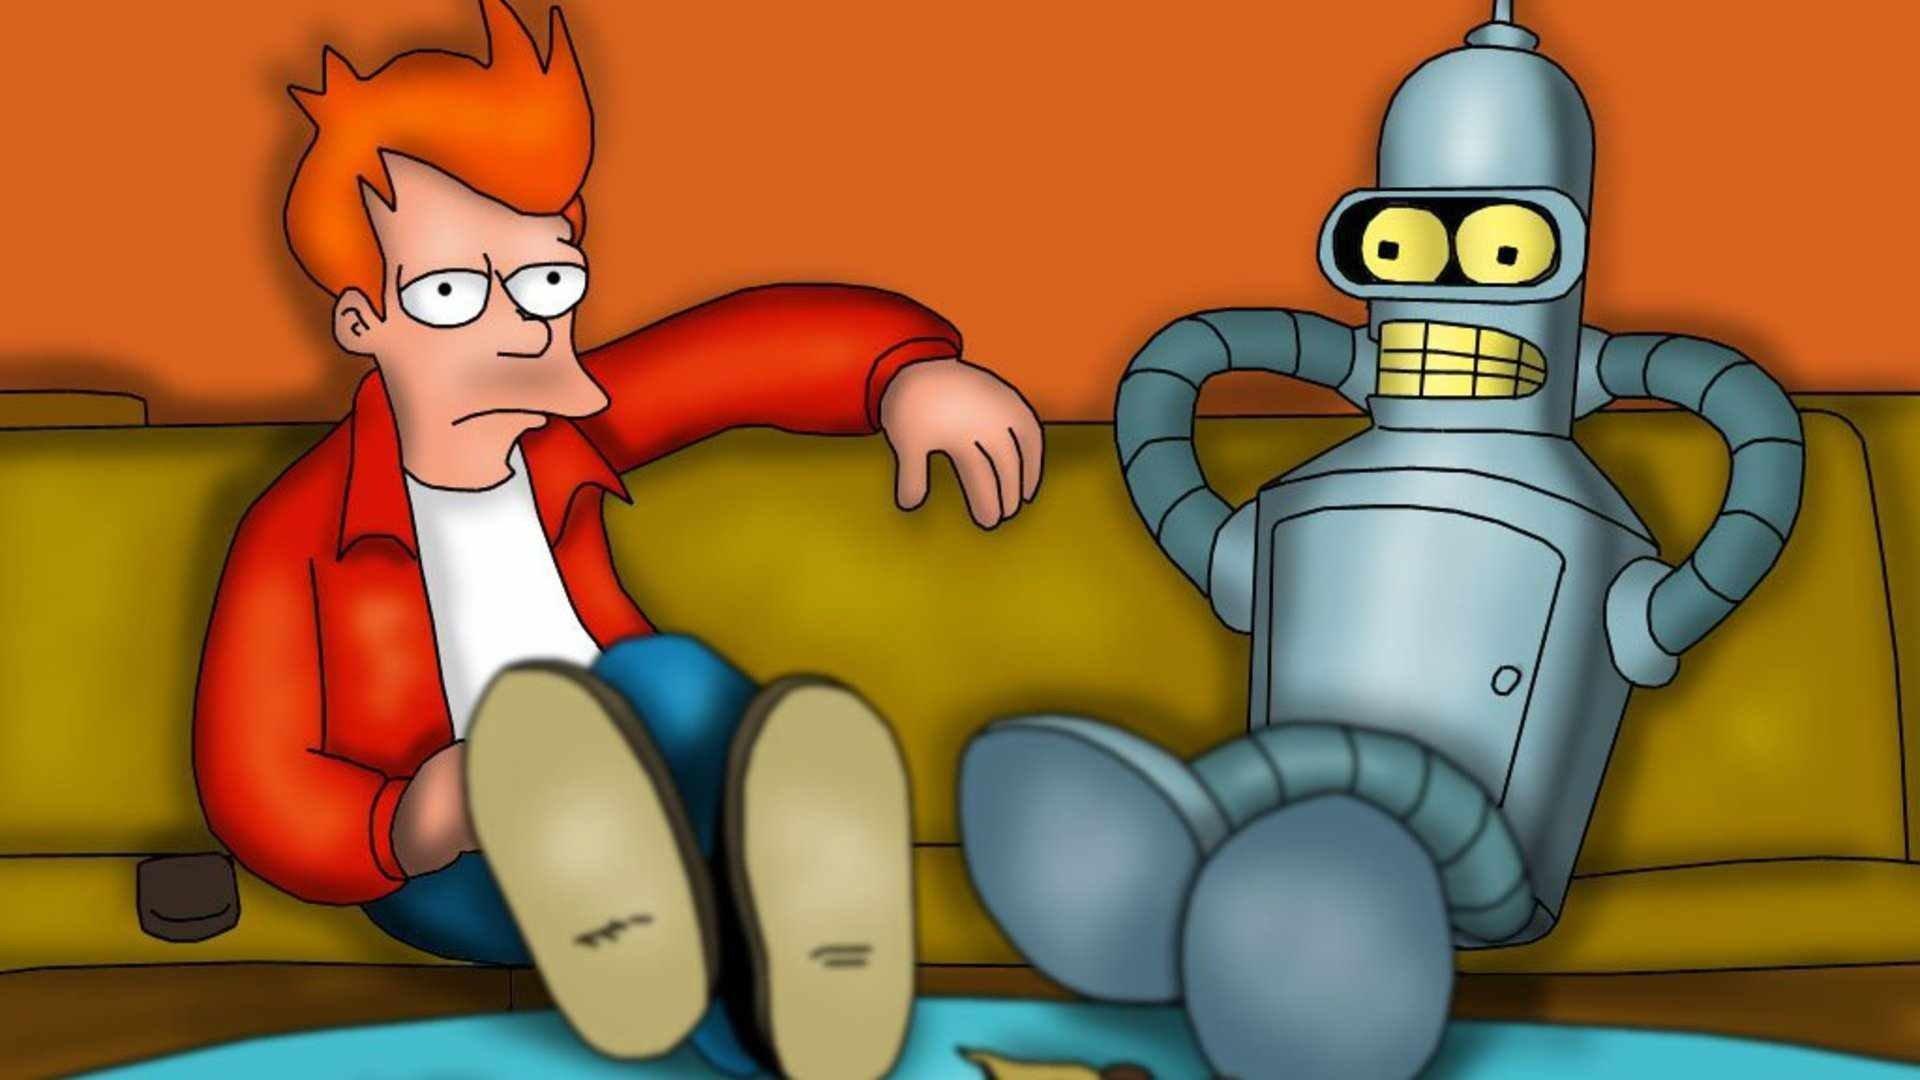 Futurama HD Wallpaper | Background Image | 1920x1080 | ID ...